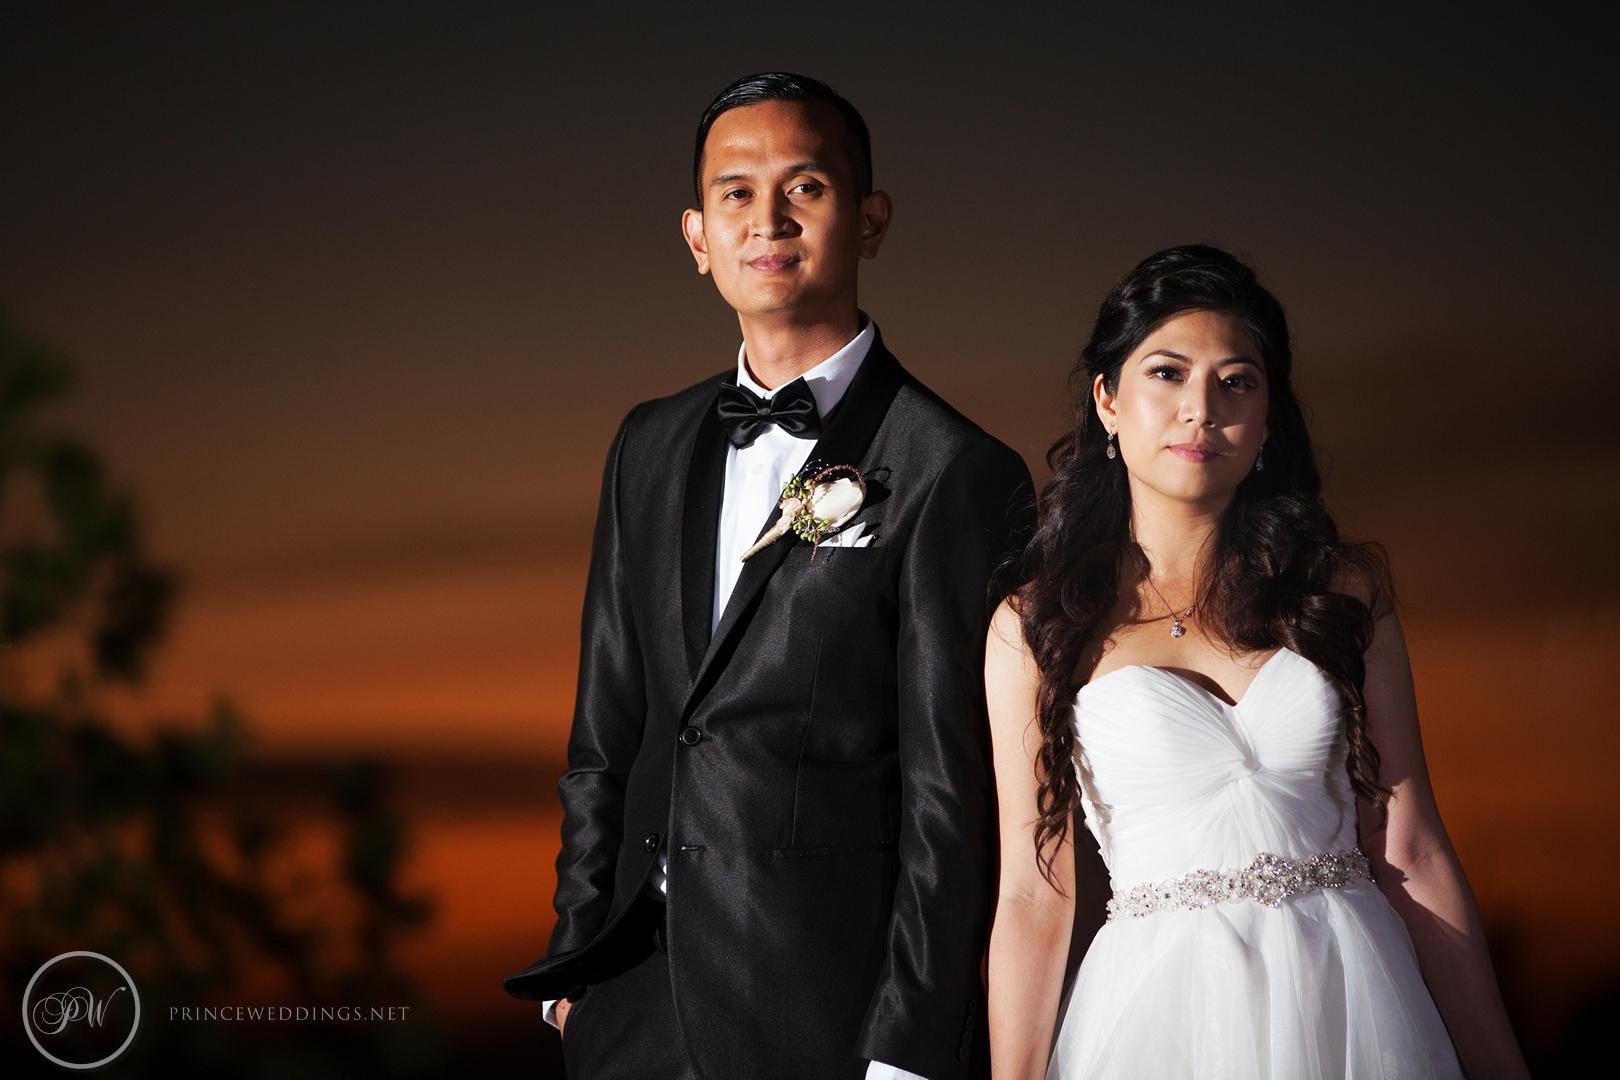 Castaway_Burbank_Wedding_Photo_Christian_Autumn067.jpg